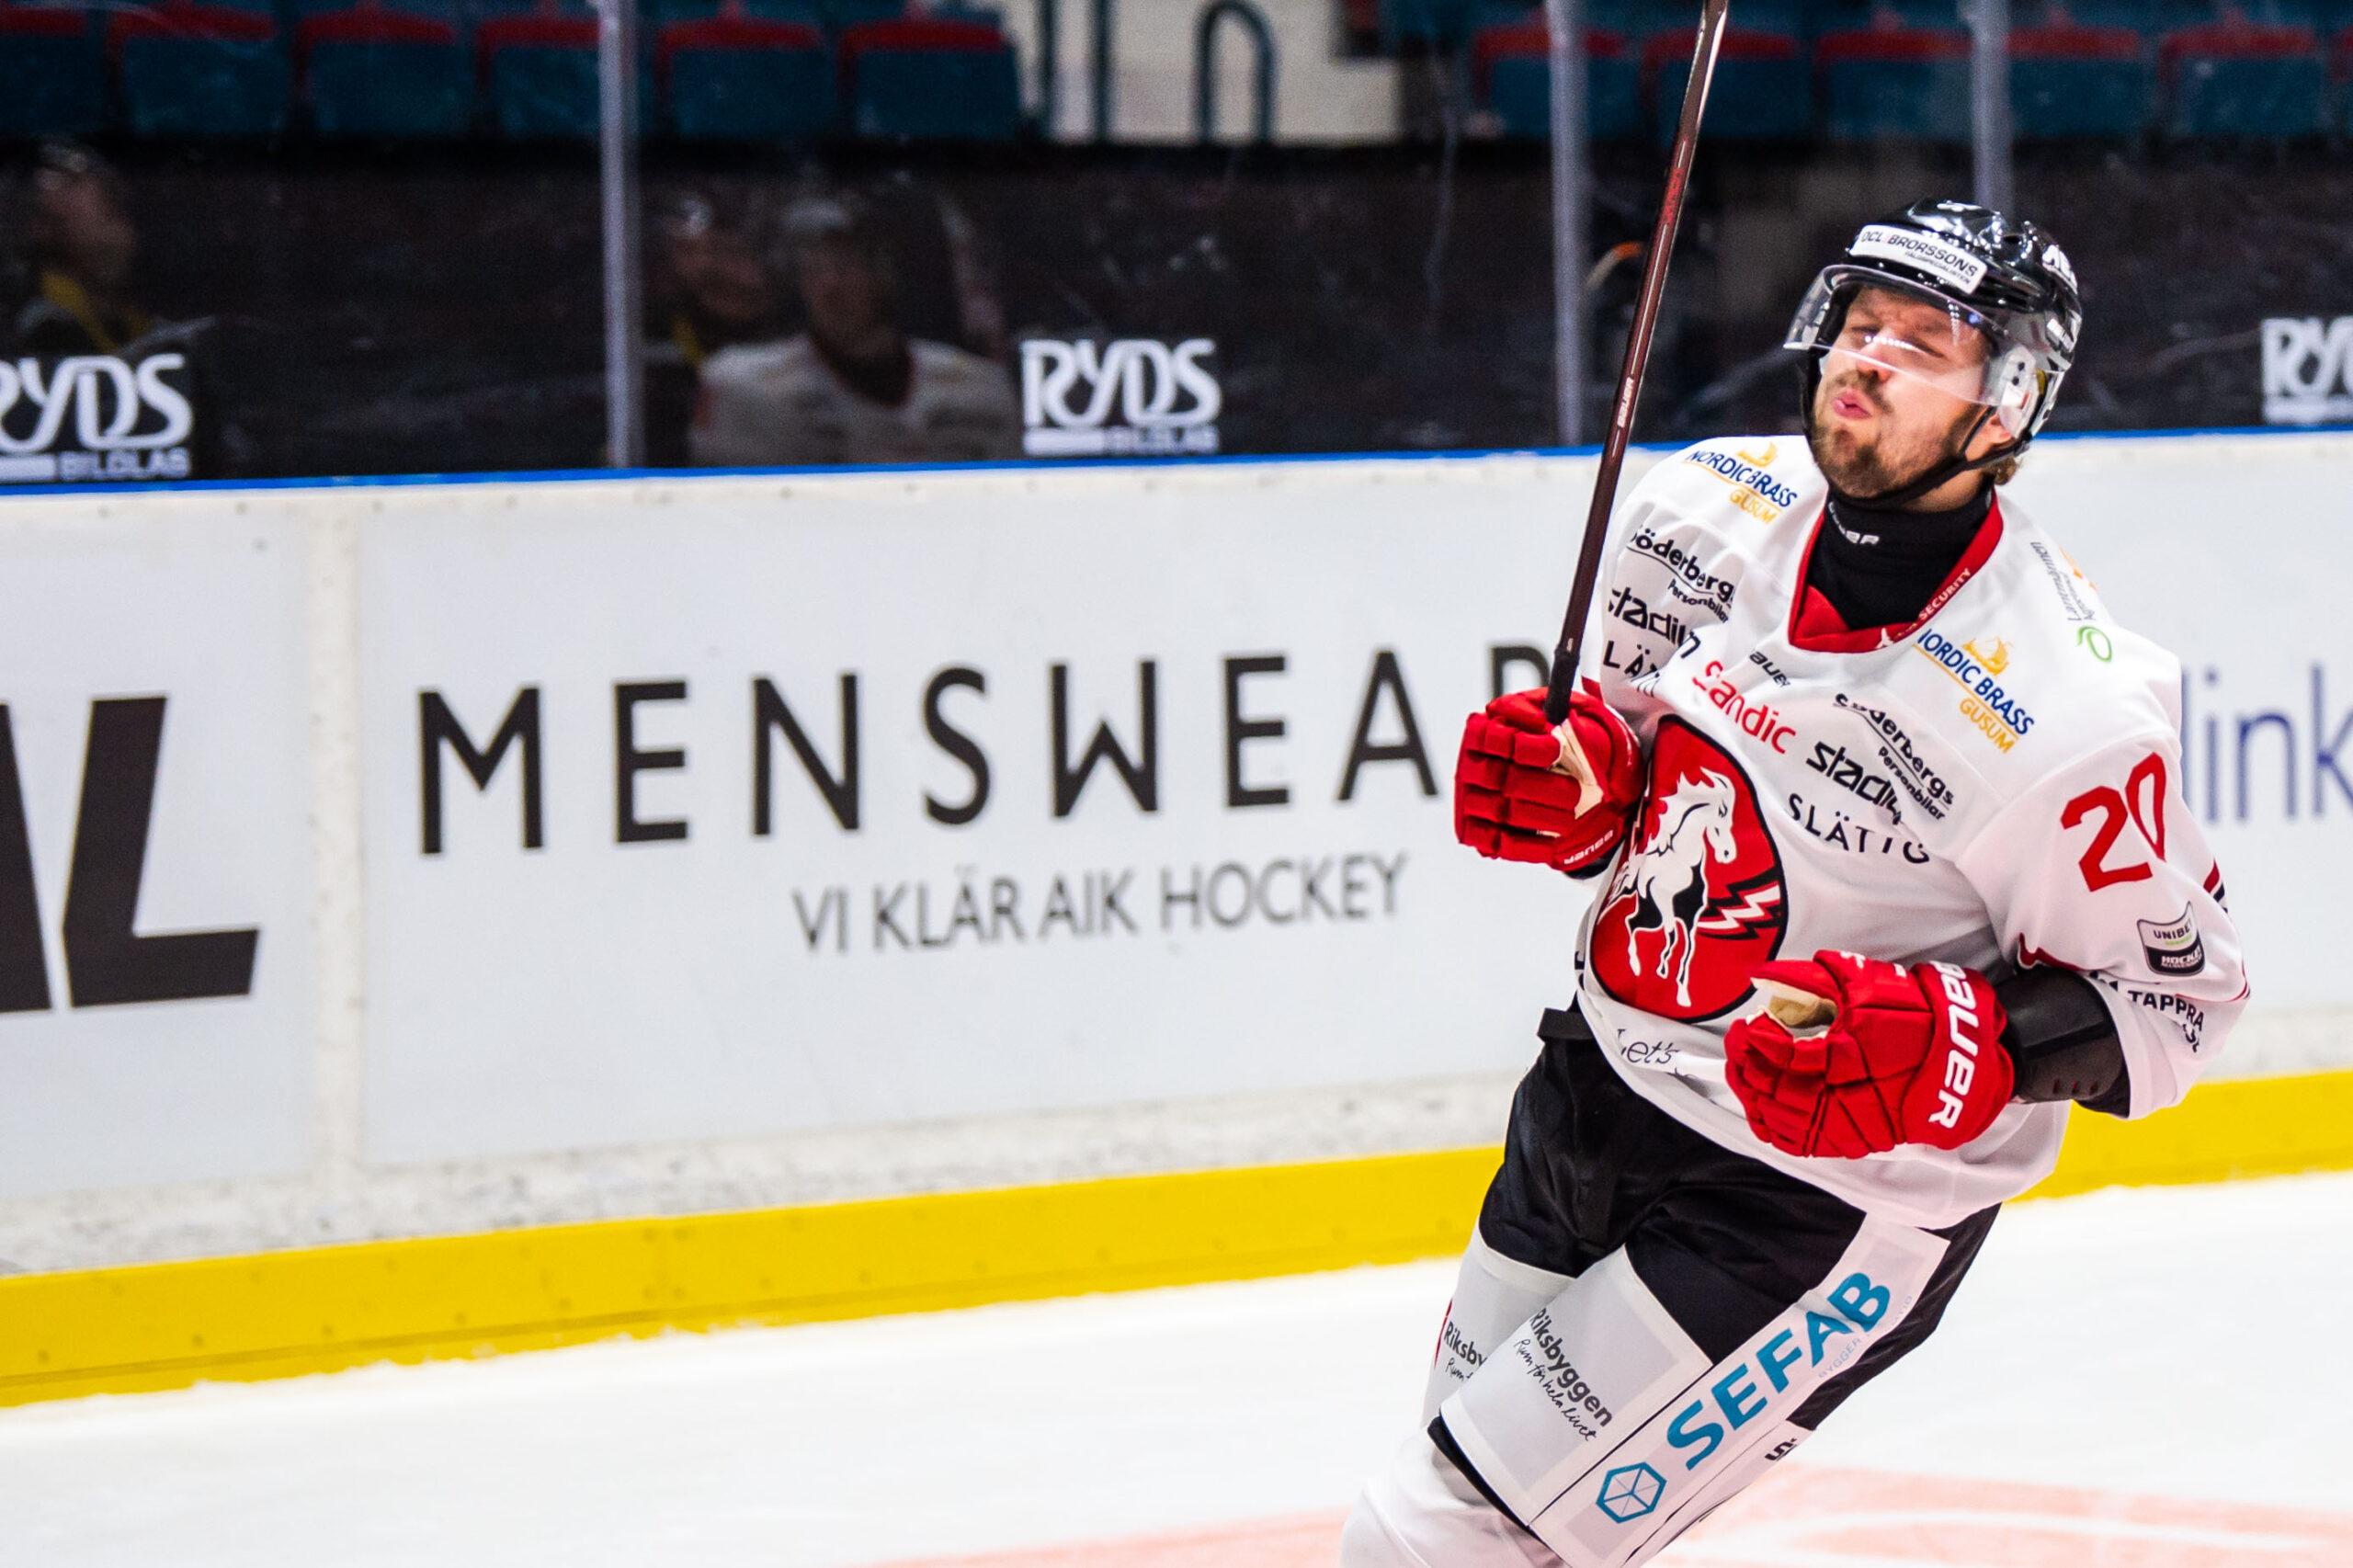 Eriksson lämnar Vita Hästen